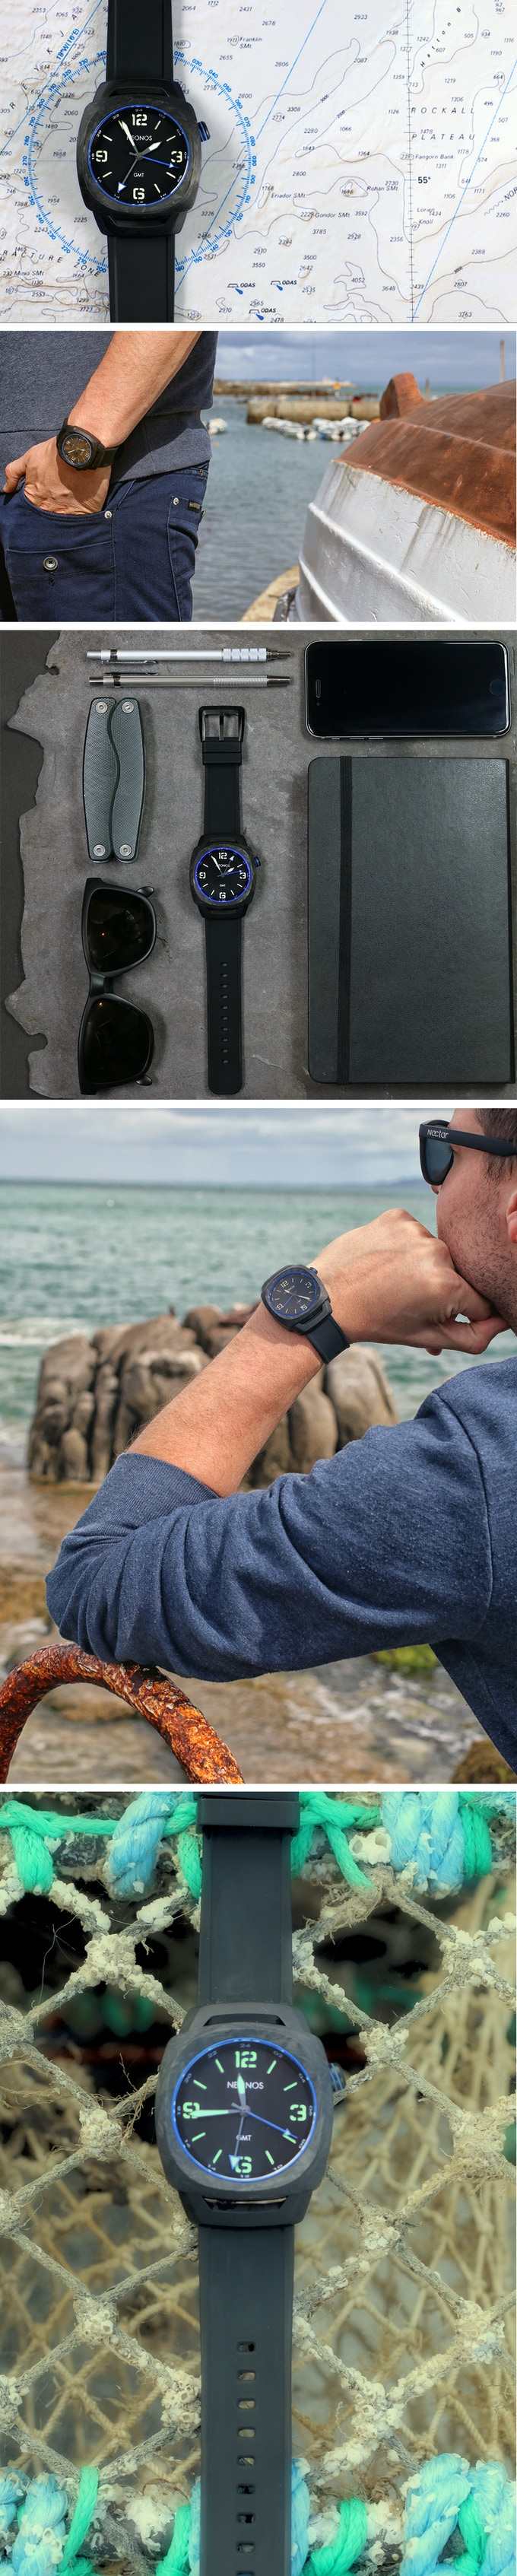 NEONOS Watch's new Holland//01 00a3826cd24093a08d8cc55f948a9dd2_original